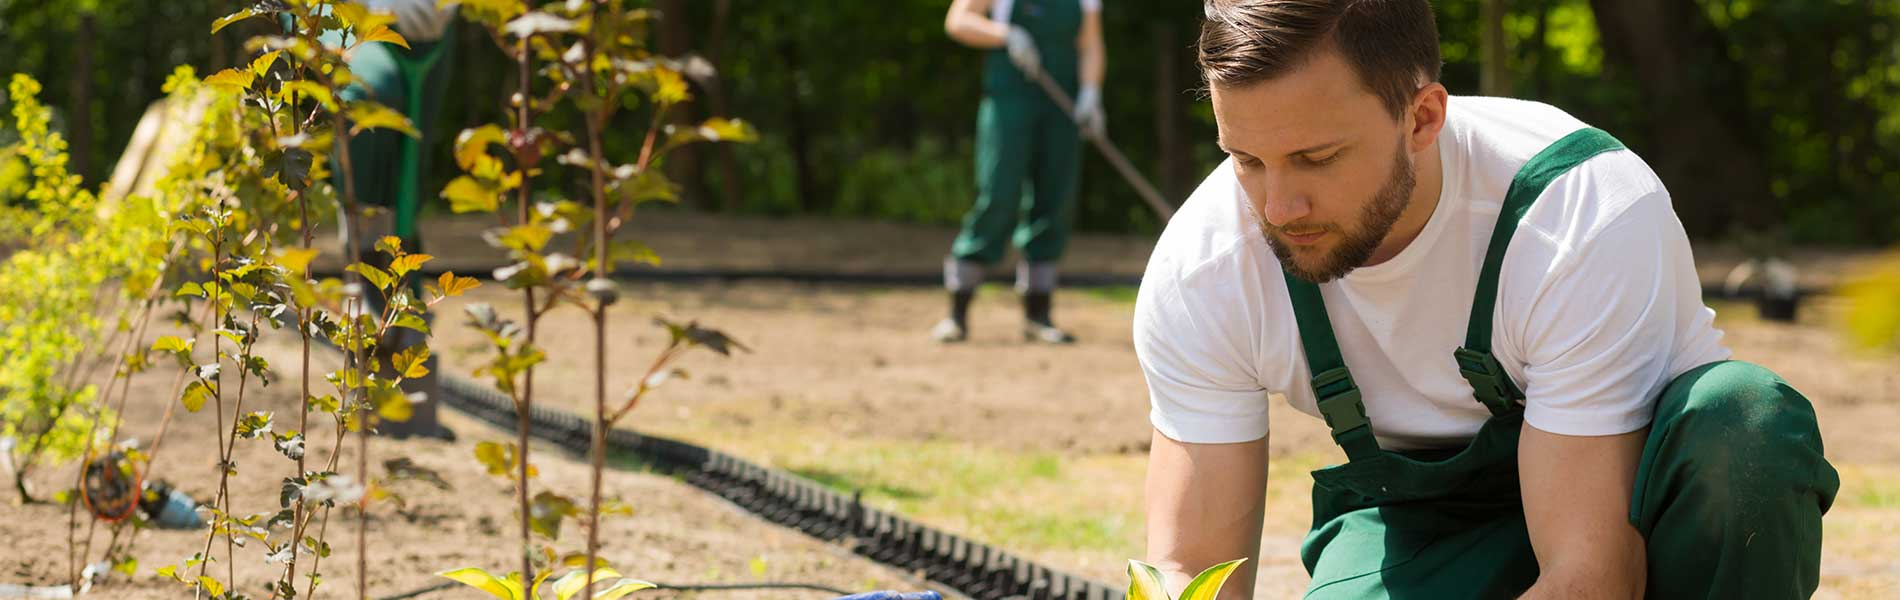 entreprise-jardinier-paysagiste-expert